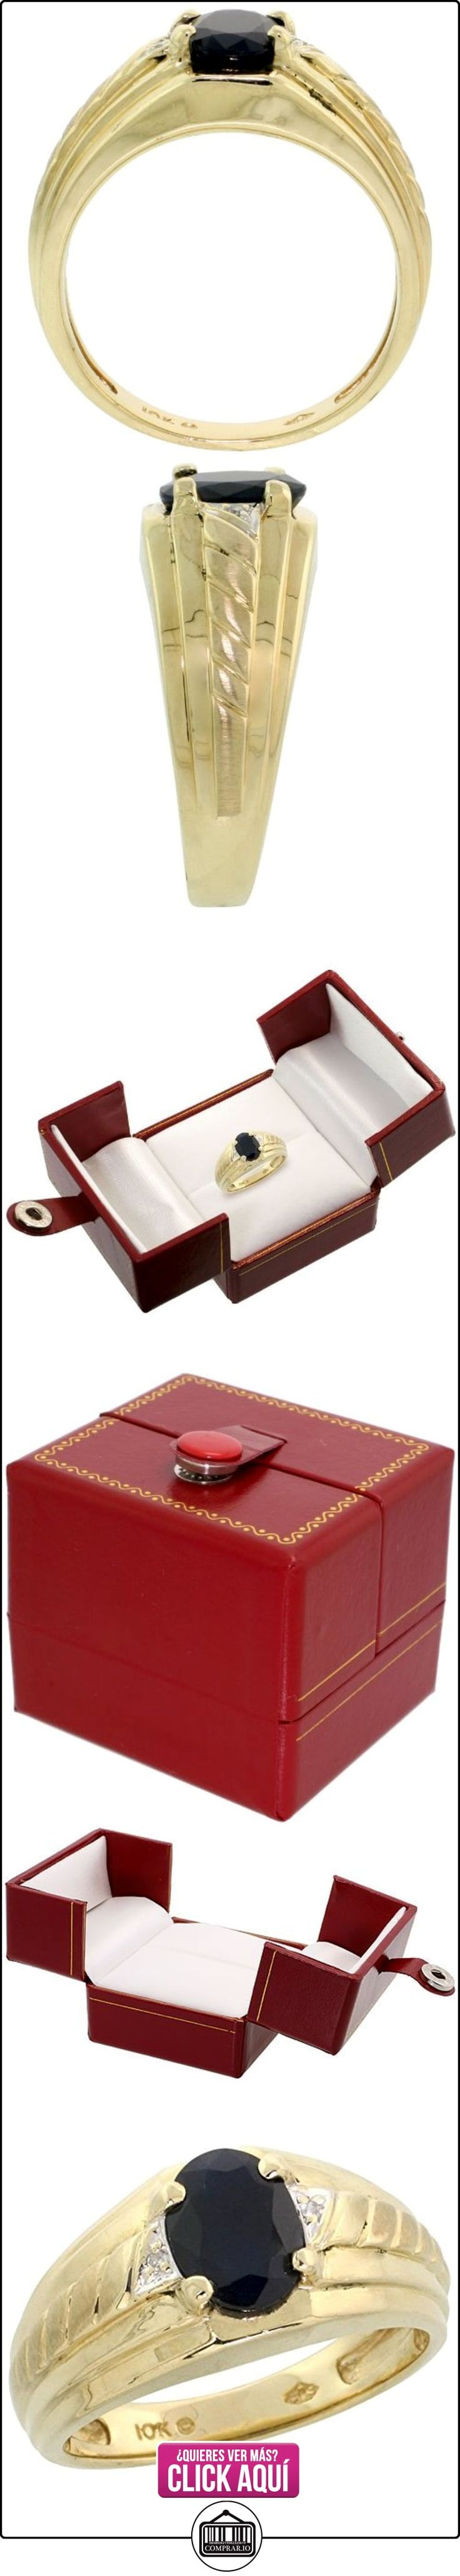 Revoni - Anillo de oro amarillo con diamante  ✿ Joyas para hombres especiales - lujo ✿ ▬► Ver oferta: http://comprar.io/goto/B0039ZHFK6